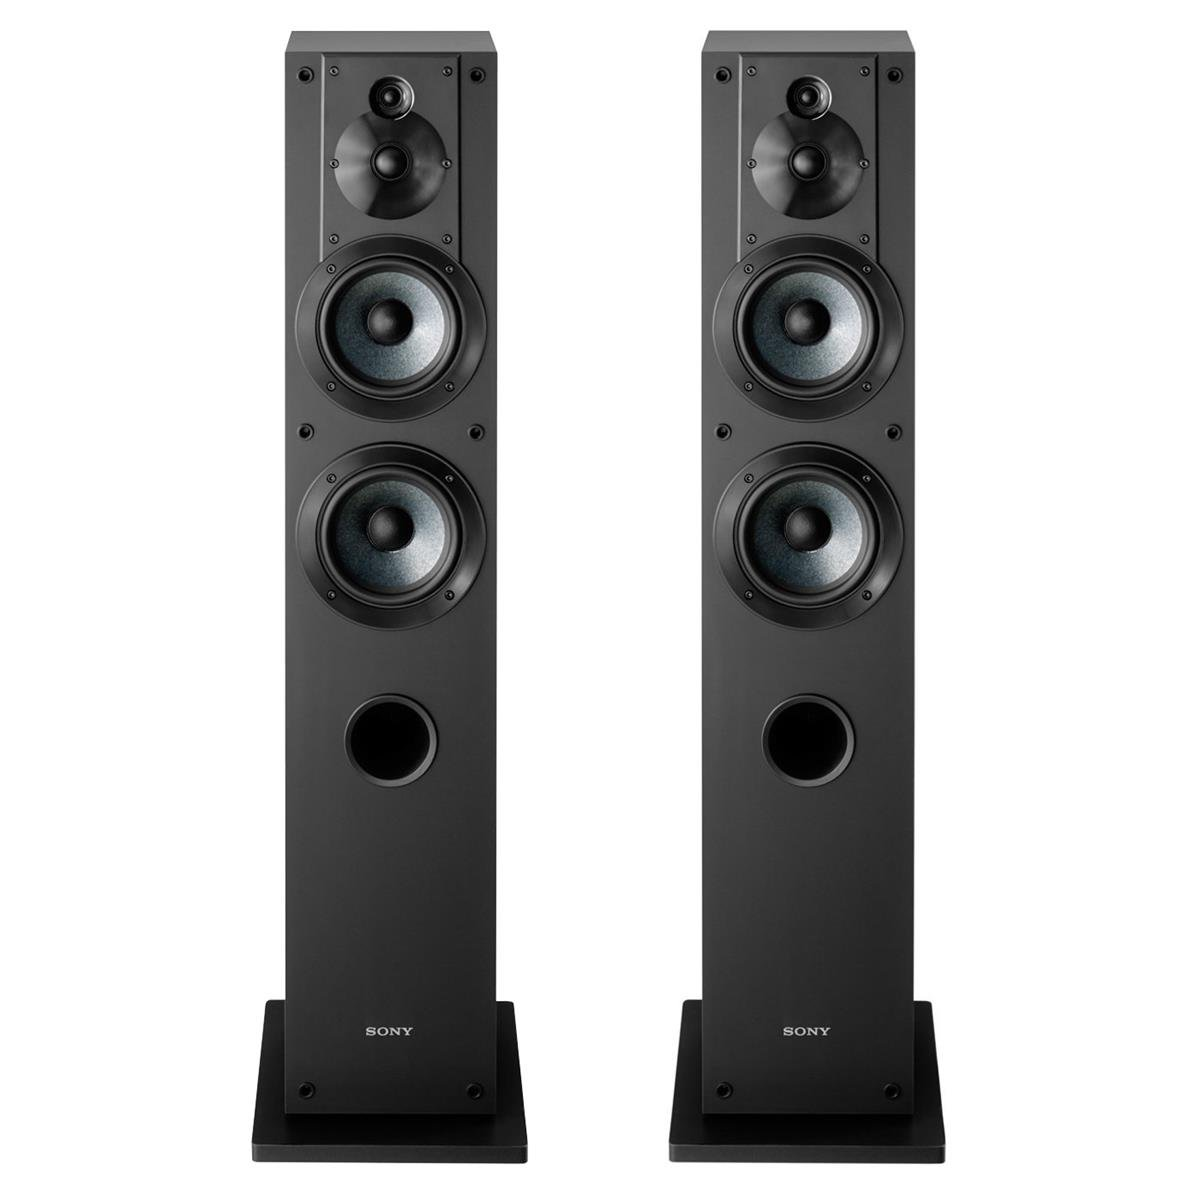 Sony SS-CS3 3-Way 4-Driver Floor-Standing Speaker - Pair (Black) by Sony